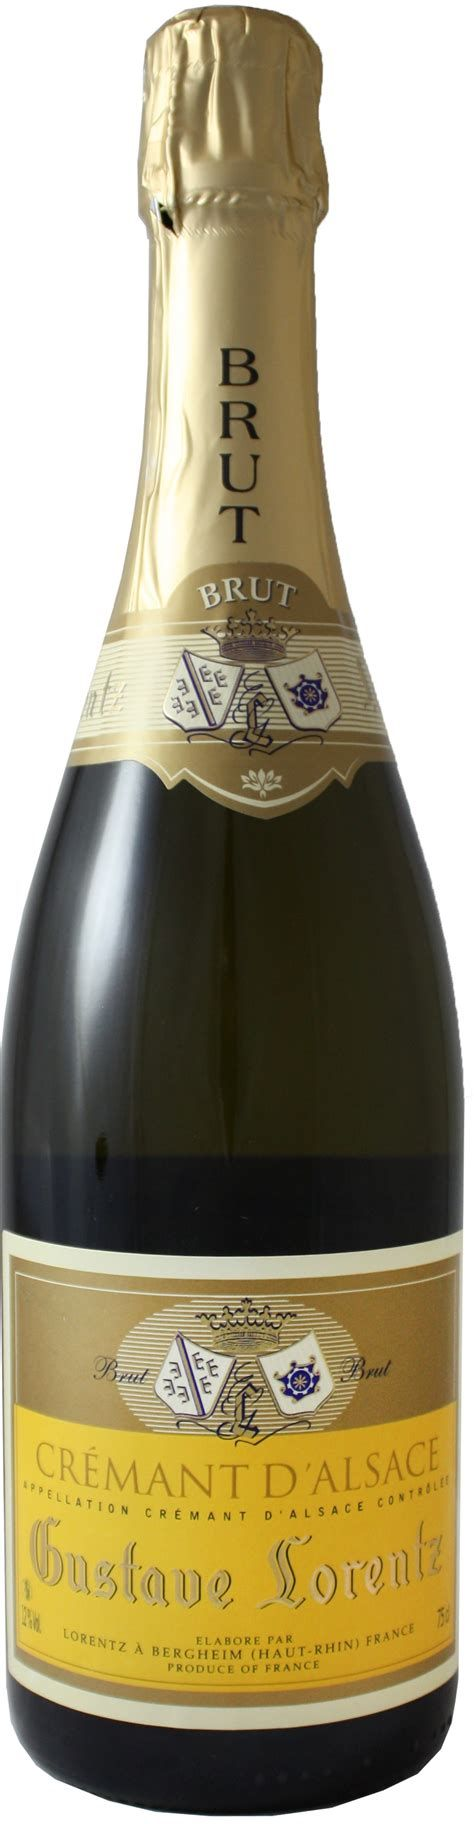 Espumante Cremant D'Alsace Gustave Lorentz Brut 750ml